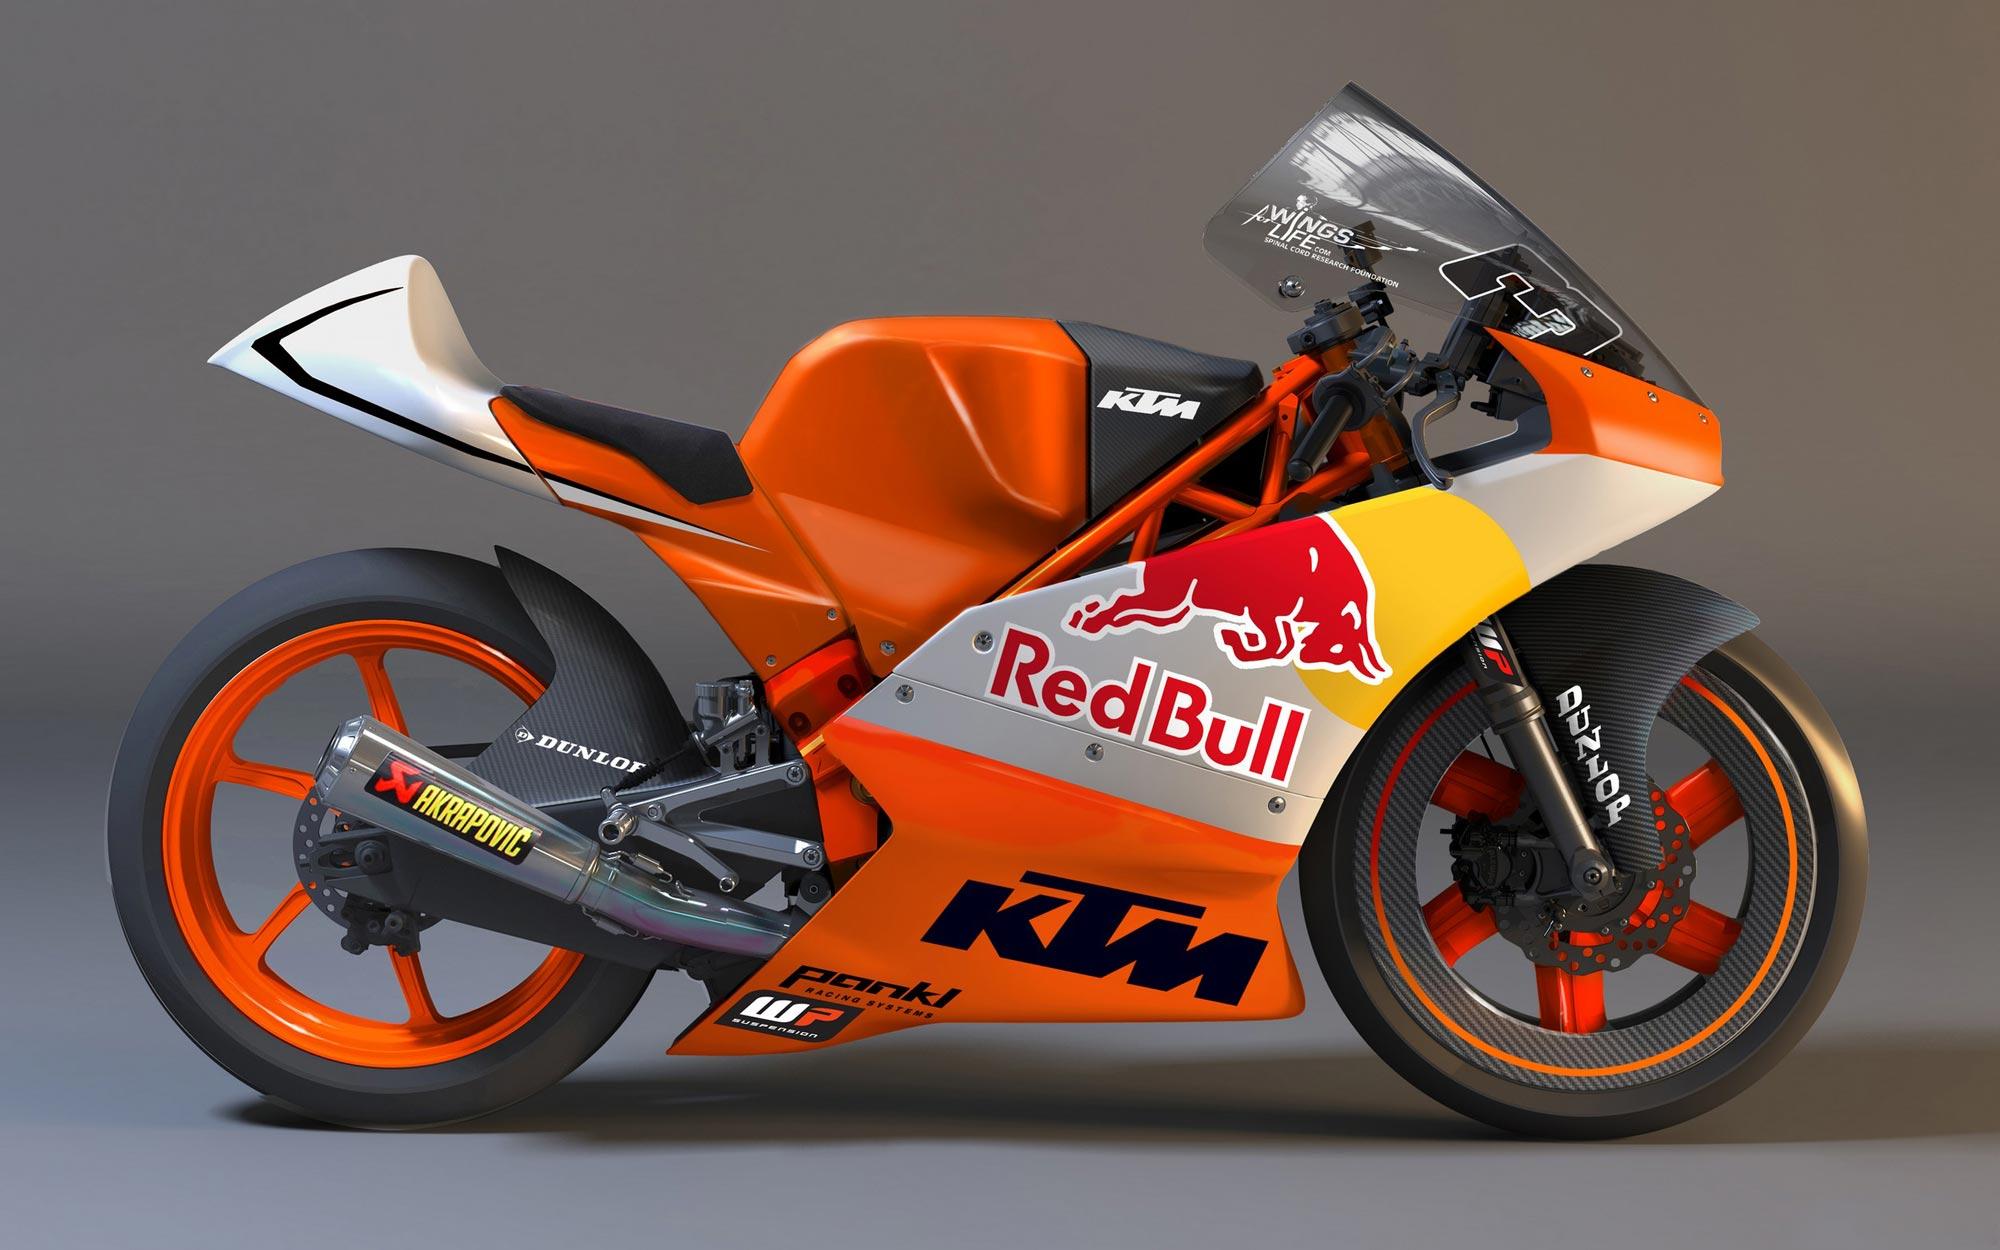 first look: ktm moto3 race bike - asphalt & rubber